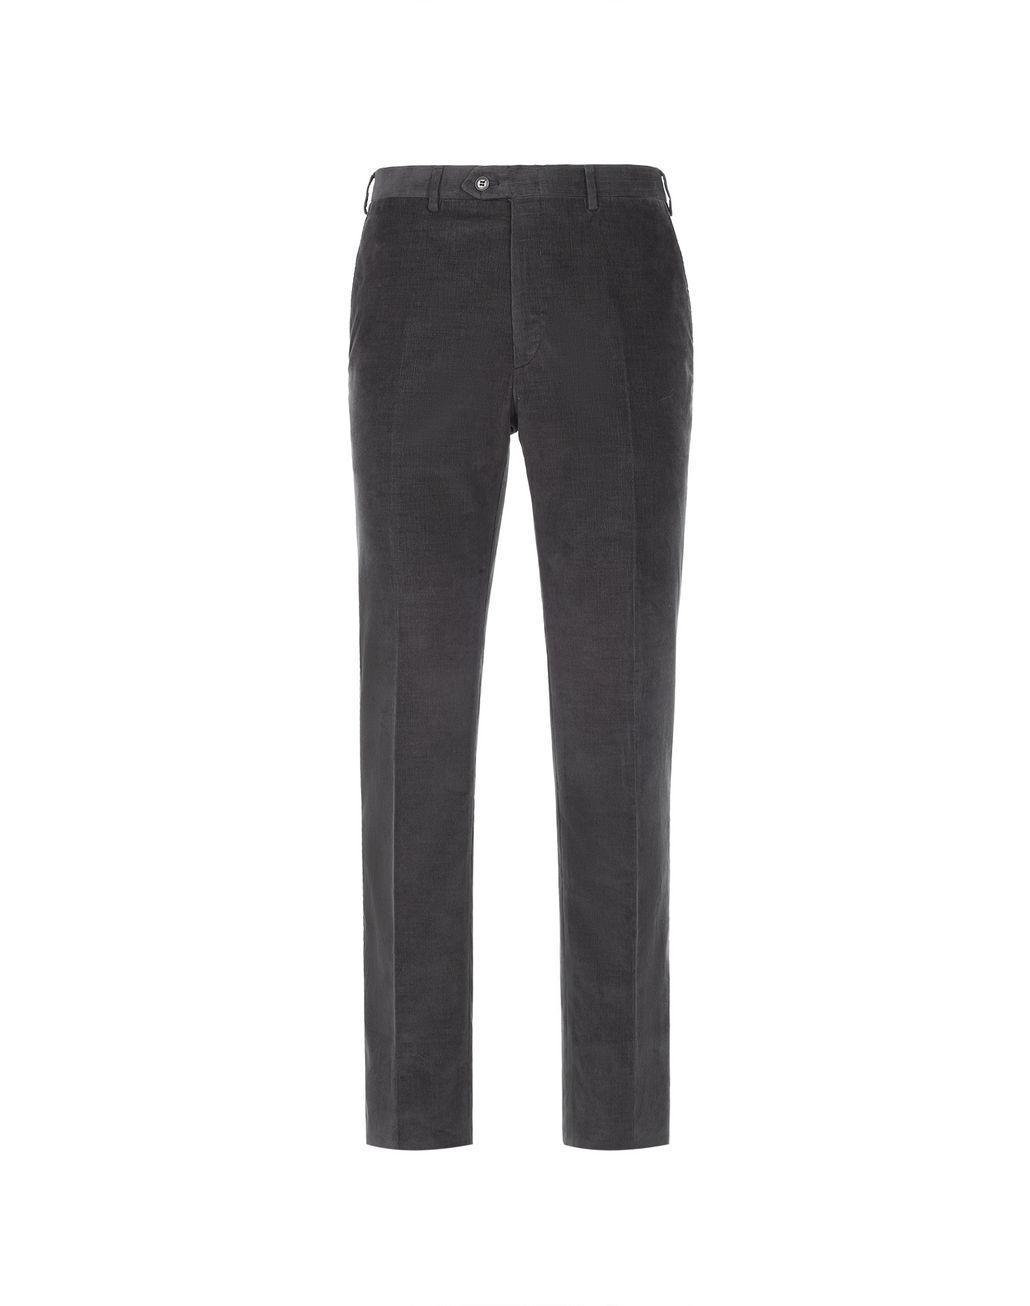 BRIONI Green Tigullio Trousers. Trousers Man f